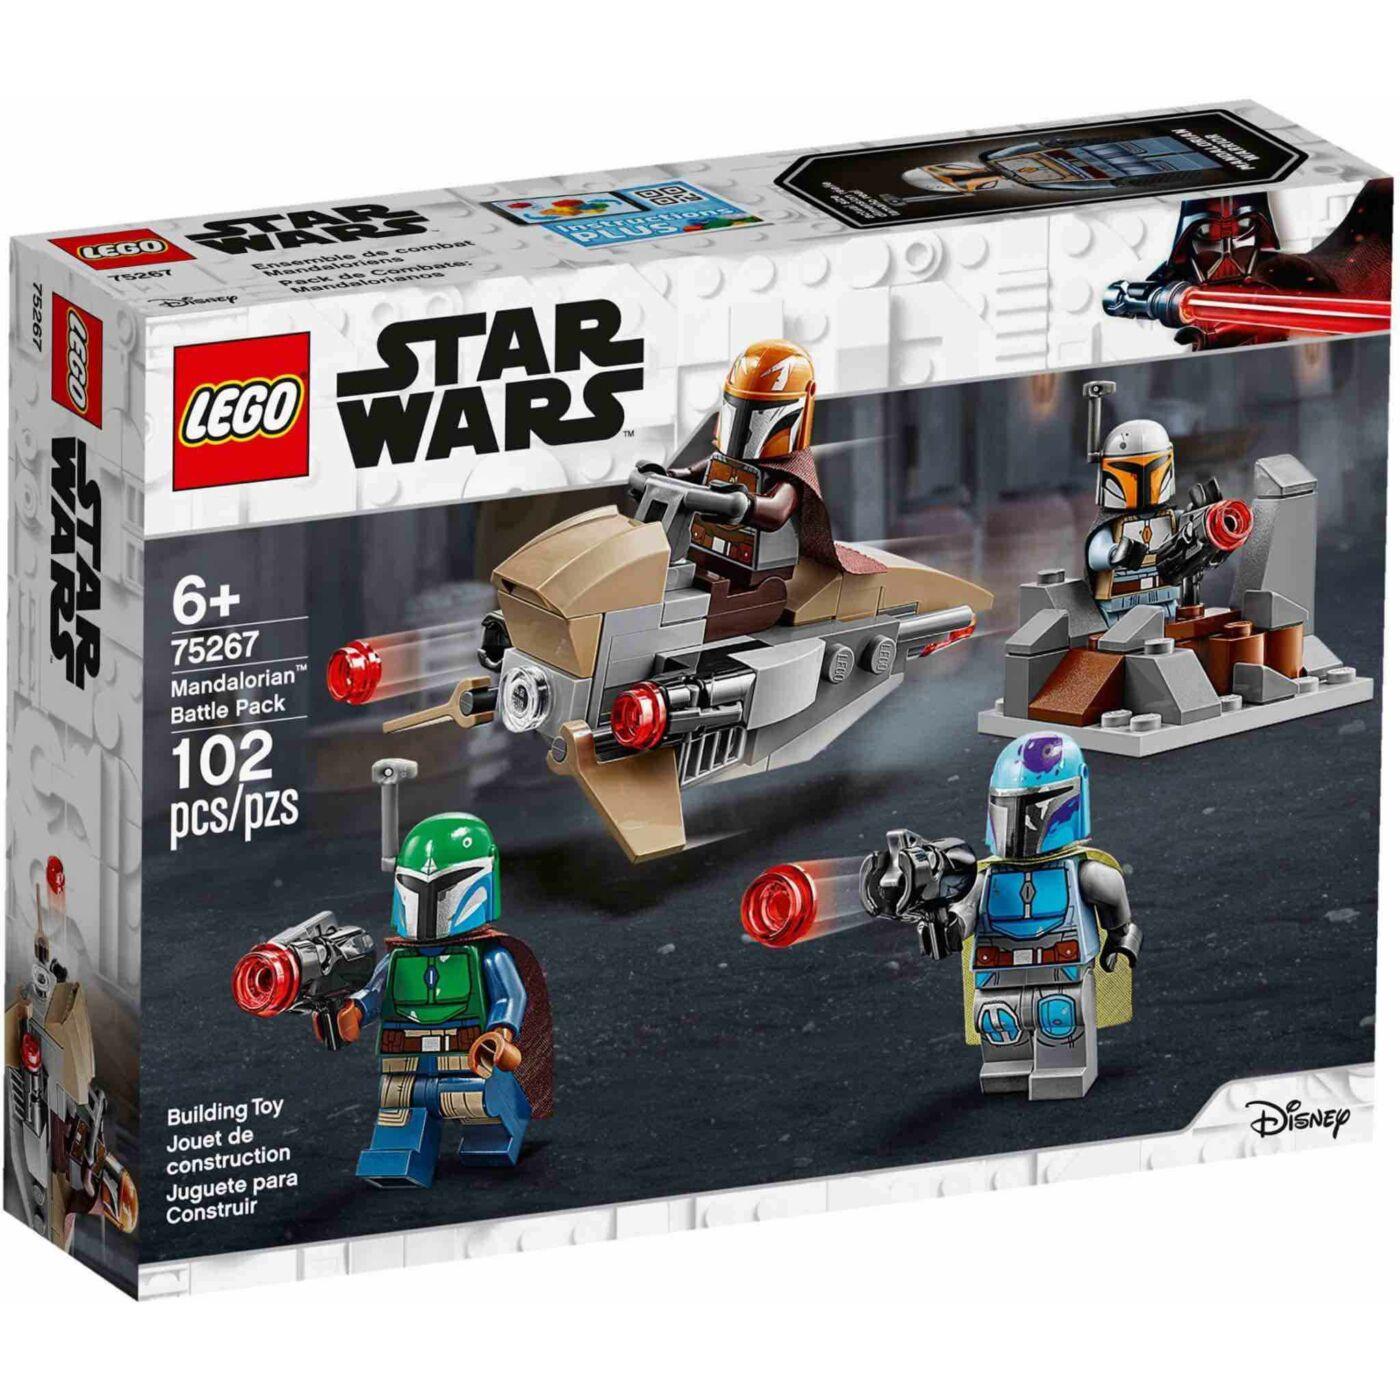 Lego Star Wars Mandalorian battle pack